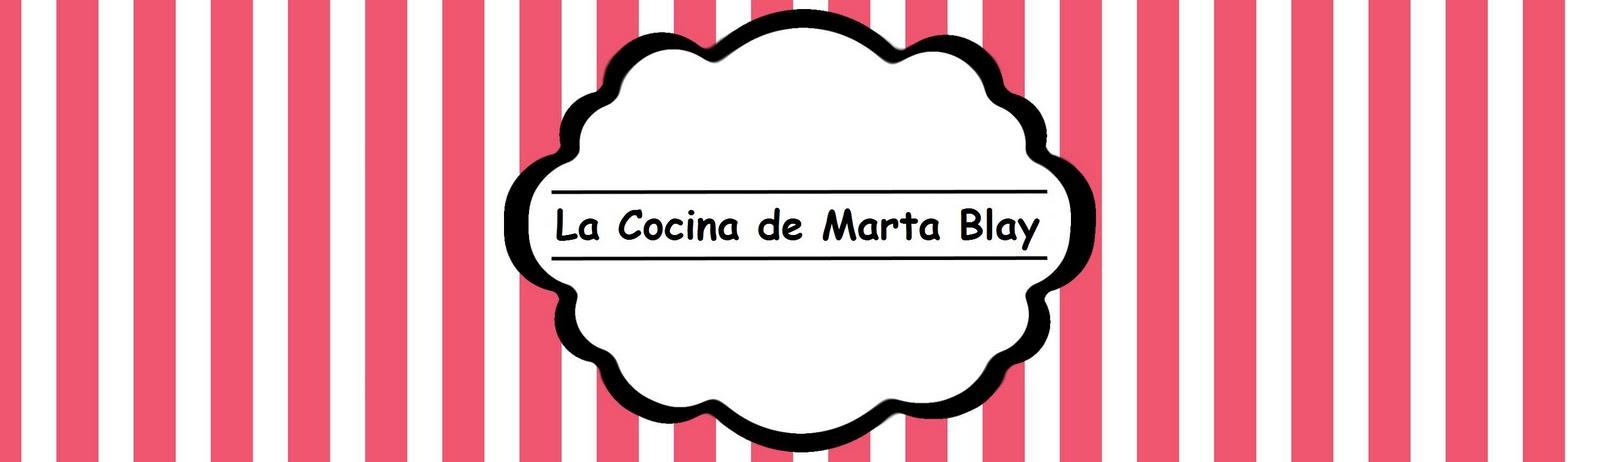 b25225fe0e2d La Cocina De Marta Blay Etiquetas Para Botellas De Agua